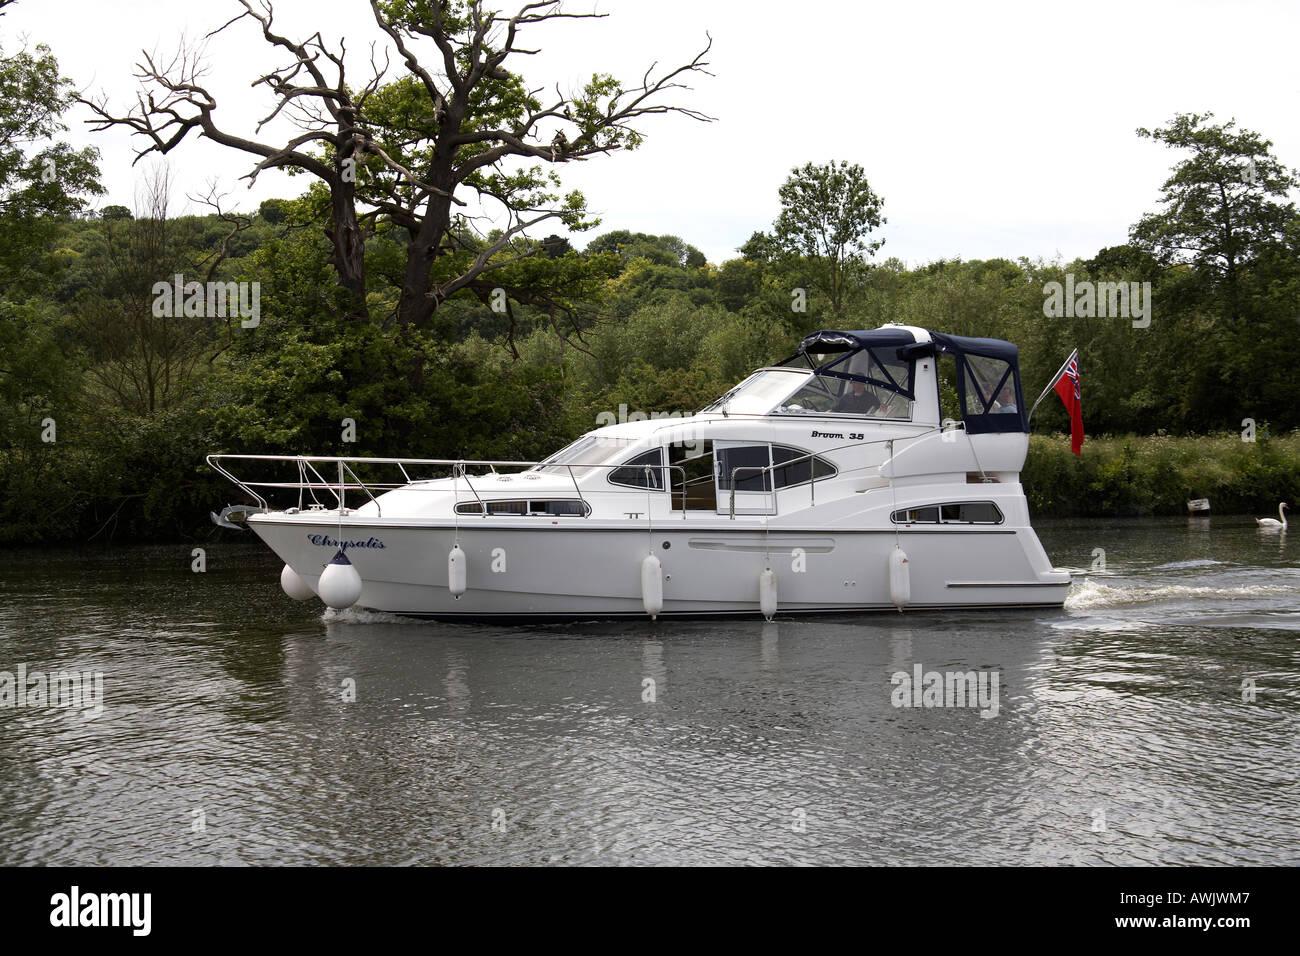 Cabin cruiser luxury motor yacht pleasure boat near medmenham on River Thames between Buckinghamshire and Berkshire Stock Photo